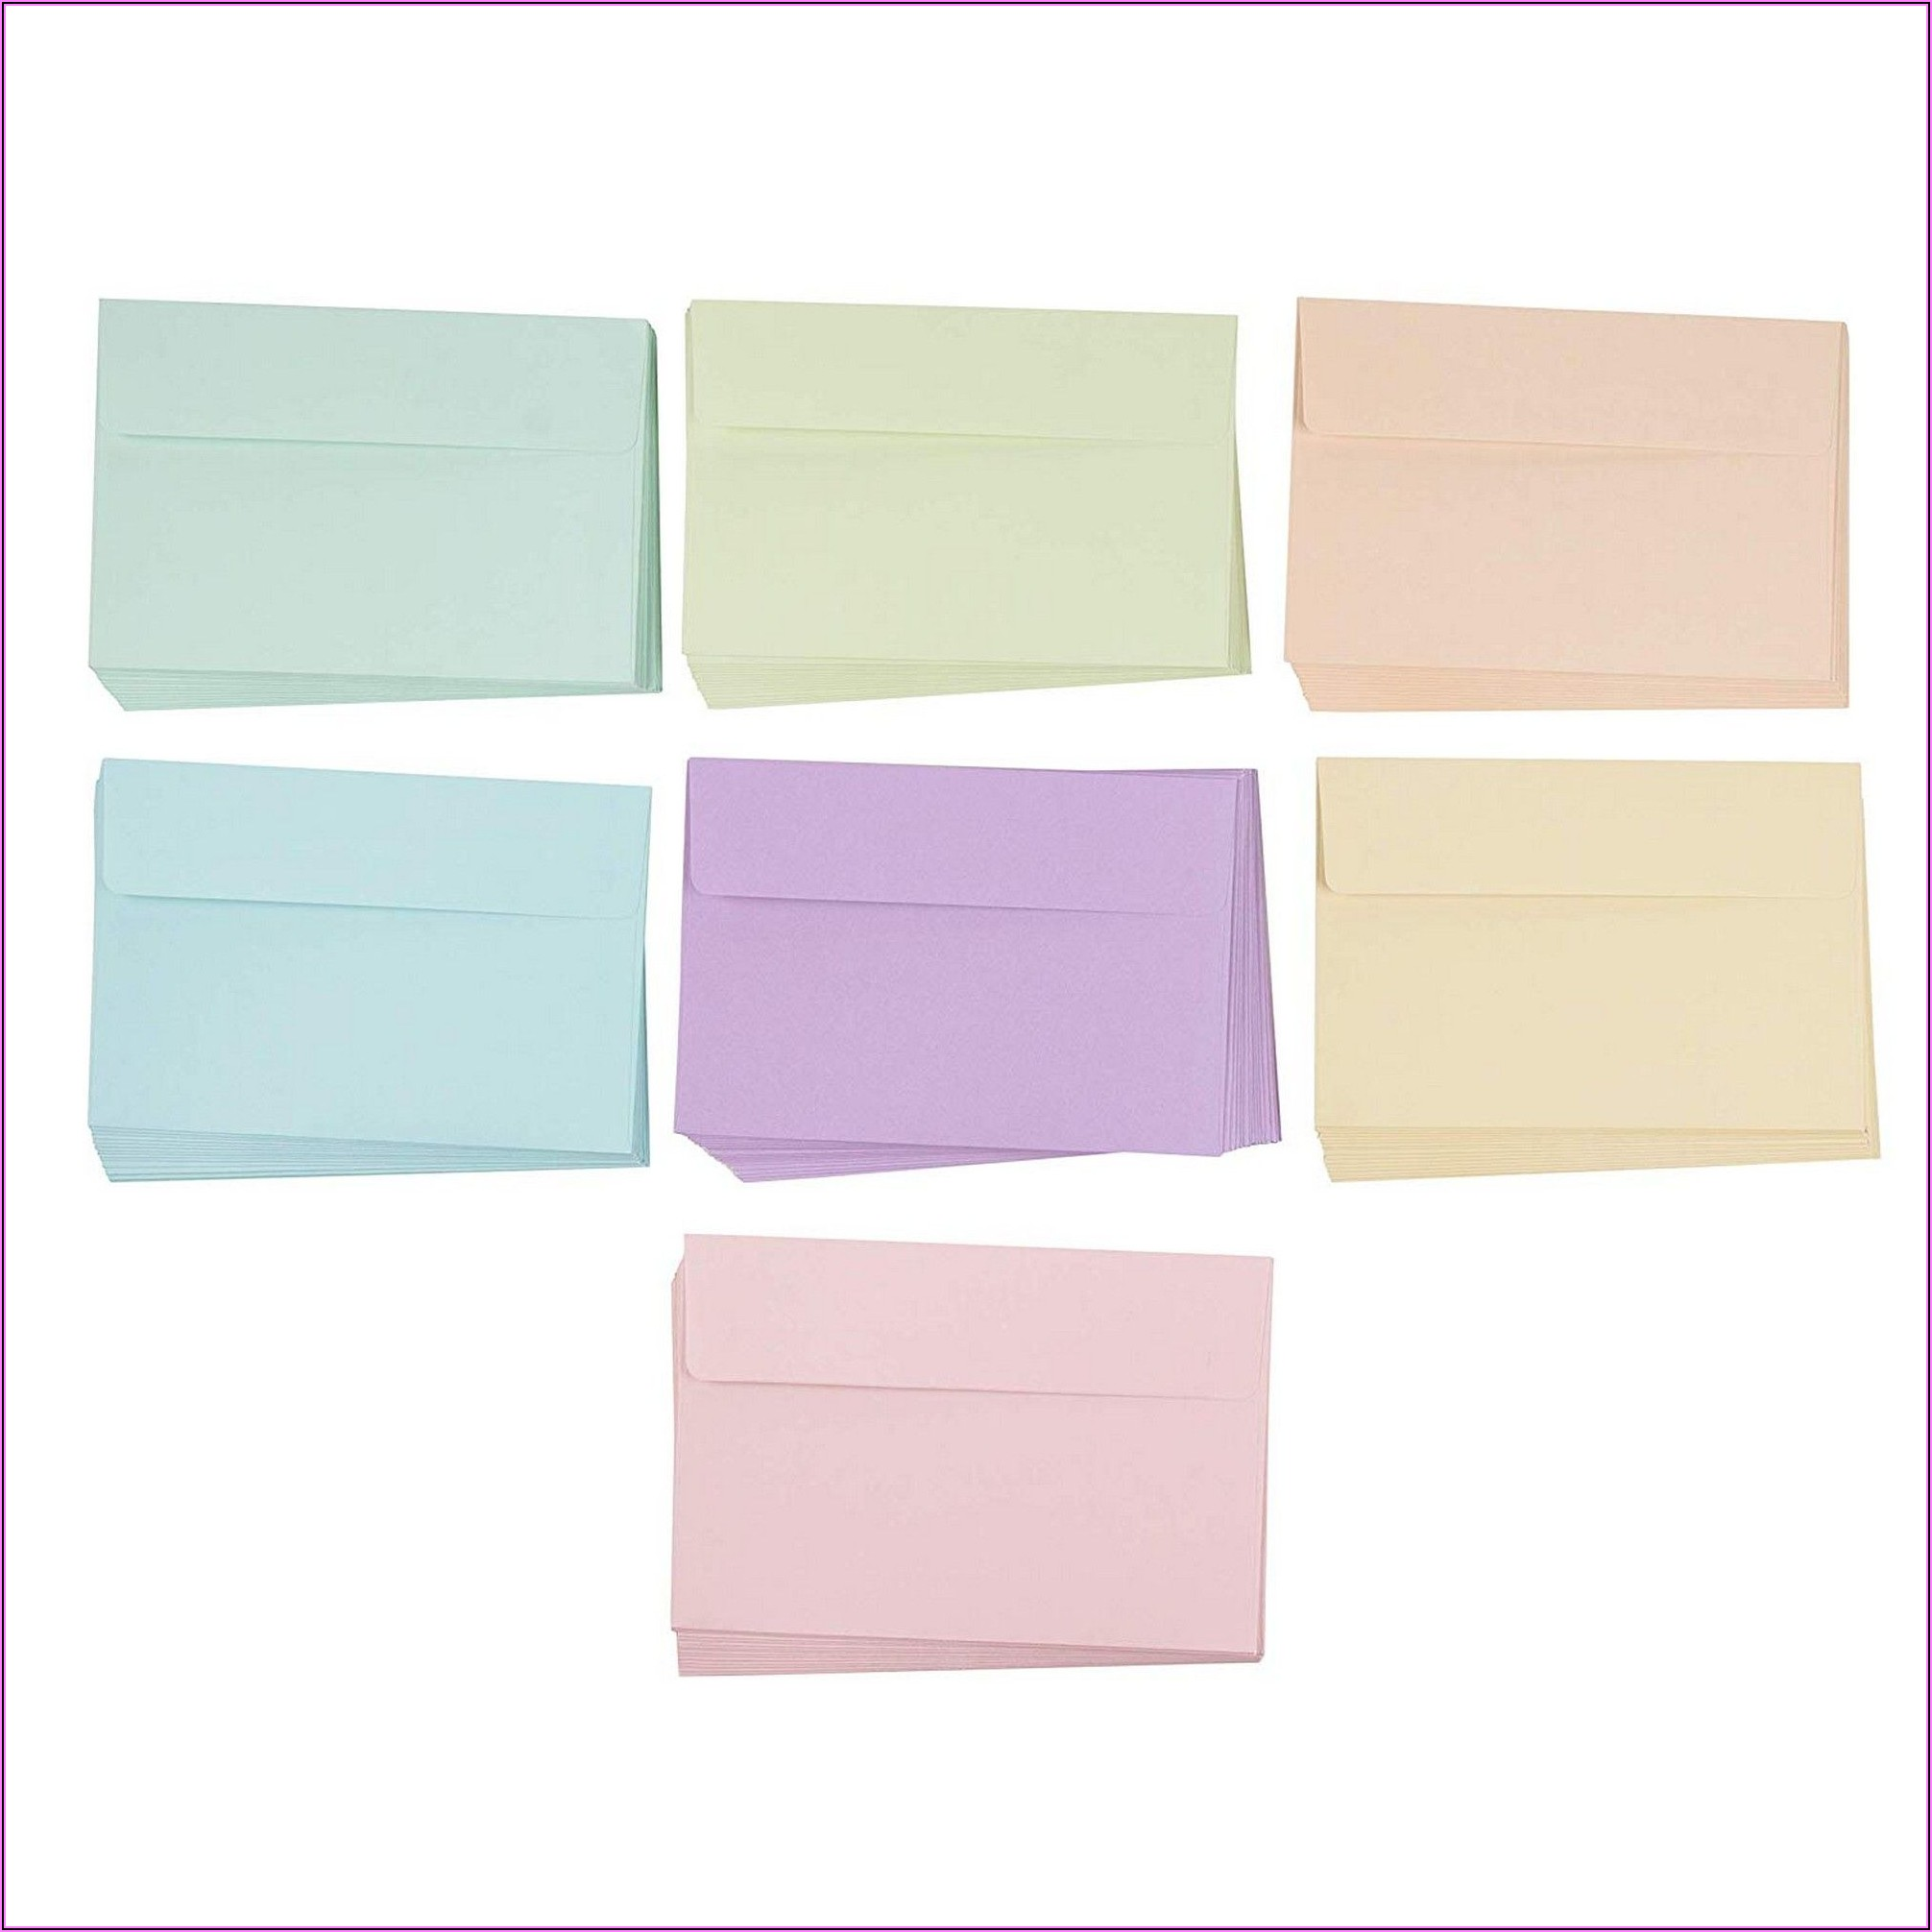 4x6 Invitation Envelopes Walmart